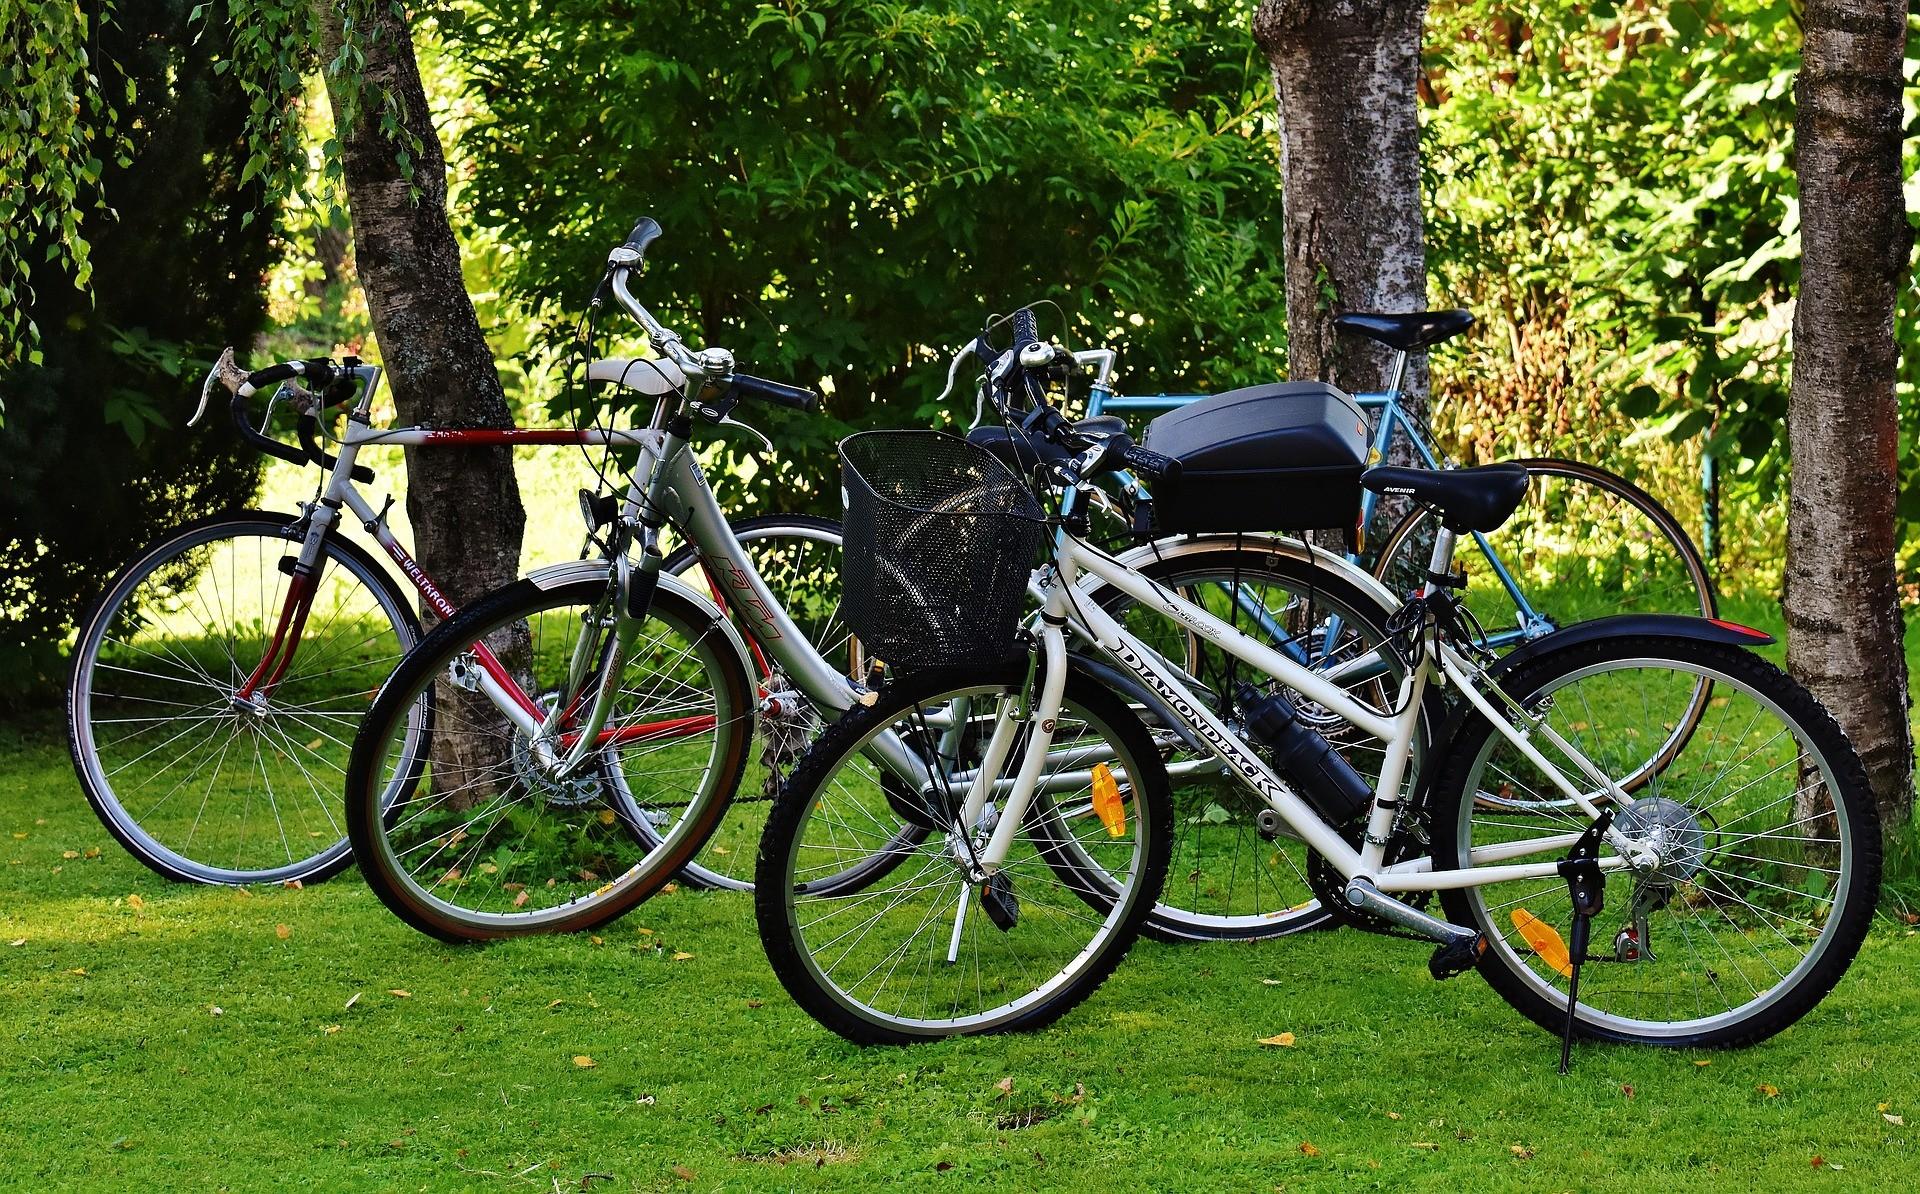 Olper Dörfer mit dem Rad entdecken am 06.08.2020